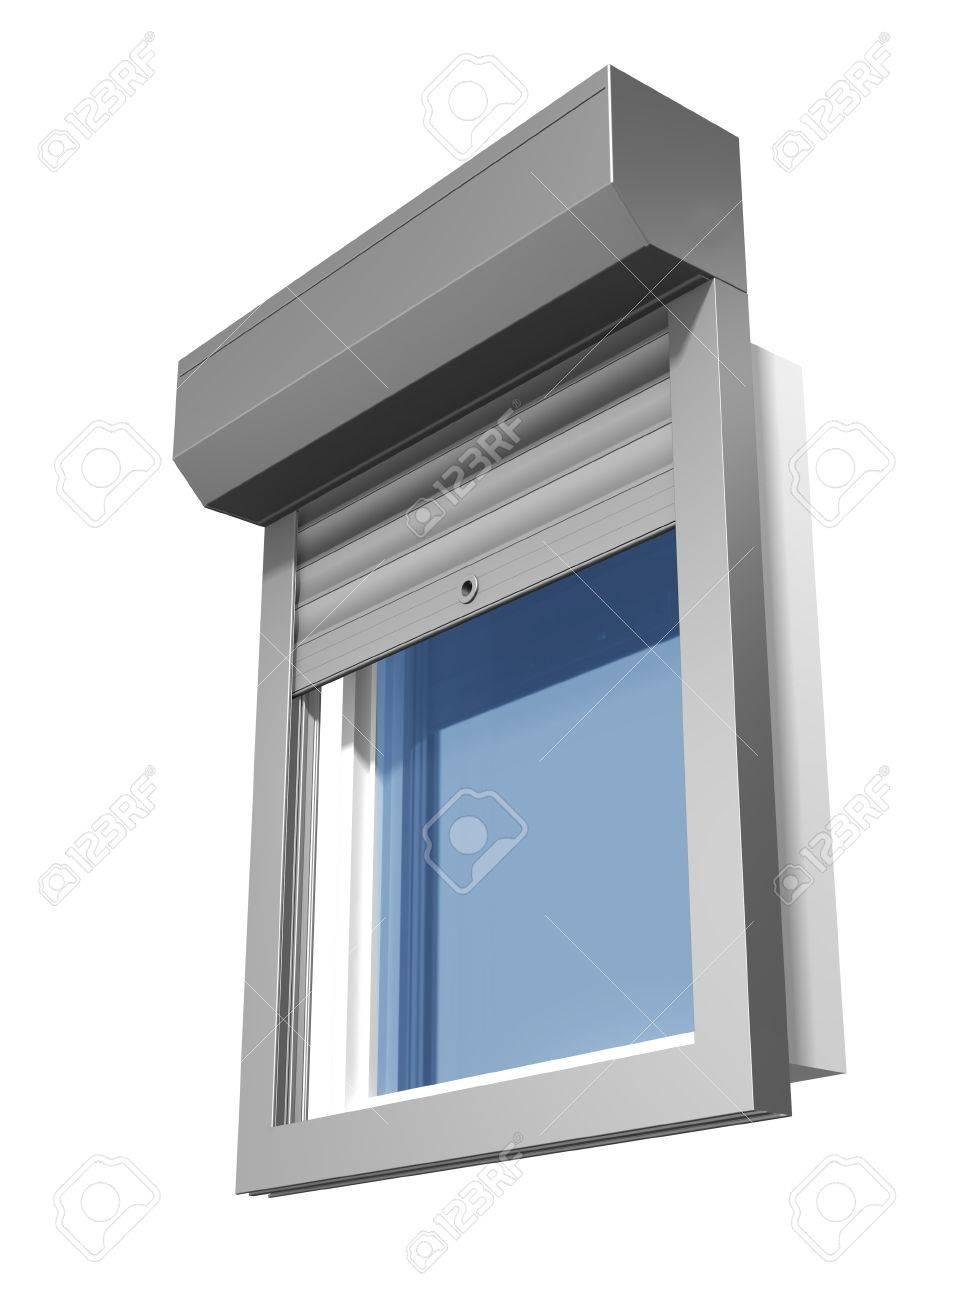 window shutter system construction Stock Photo - 11004670